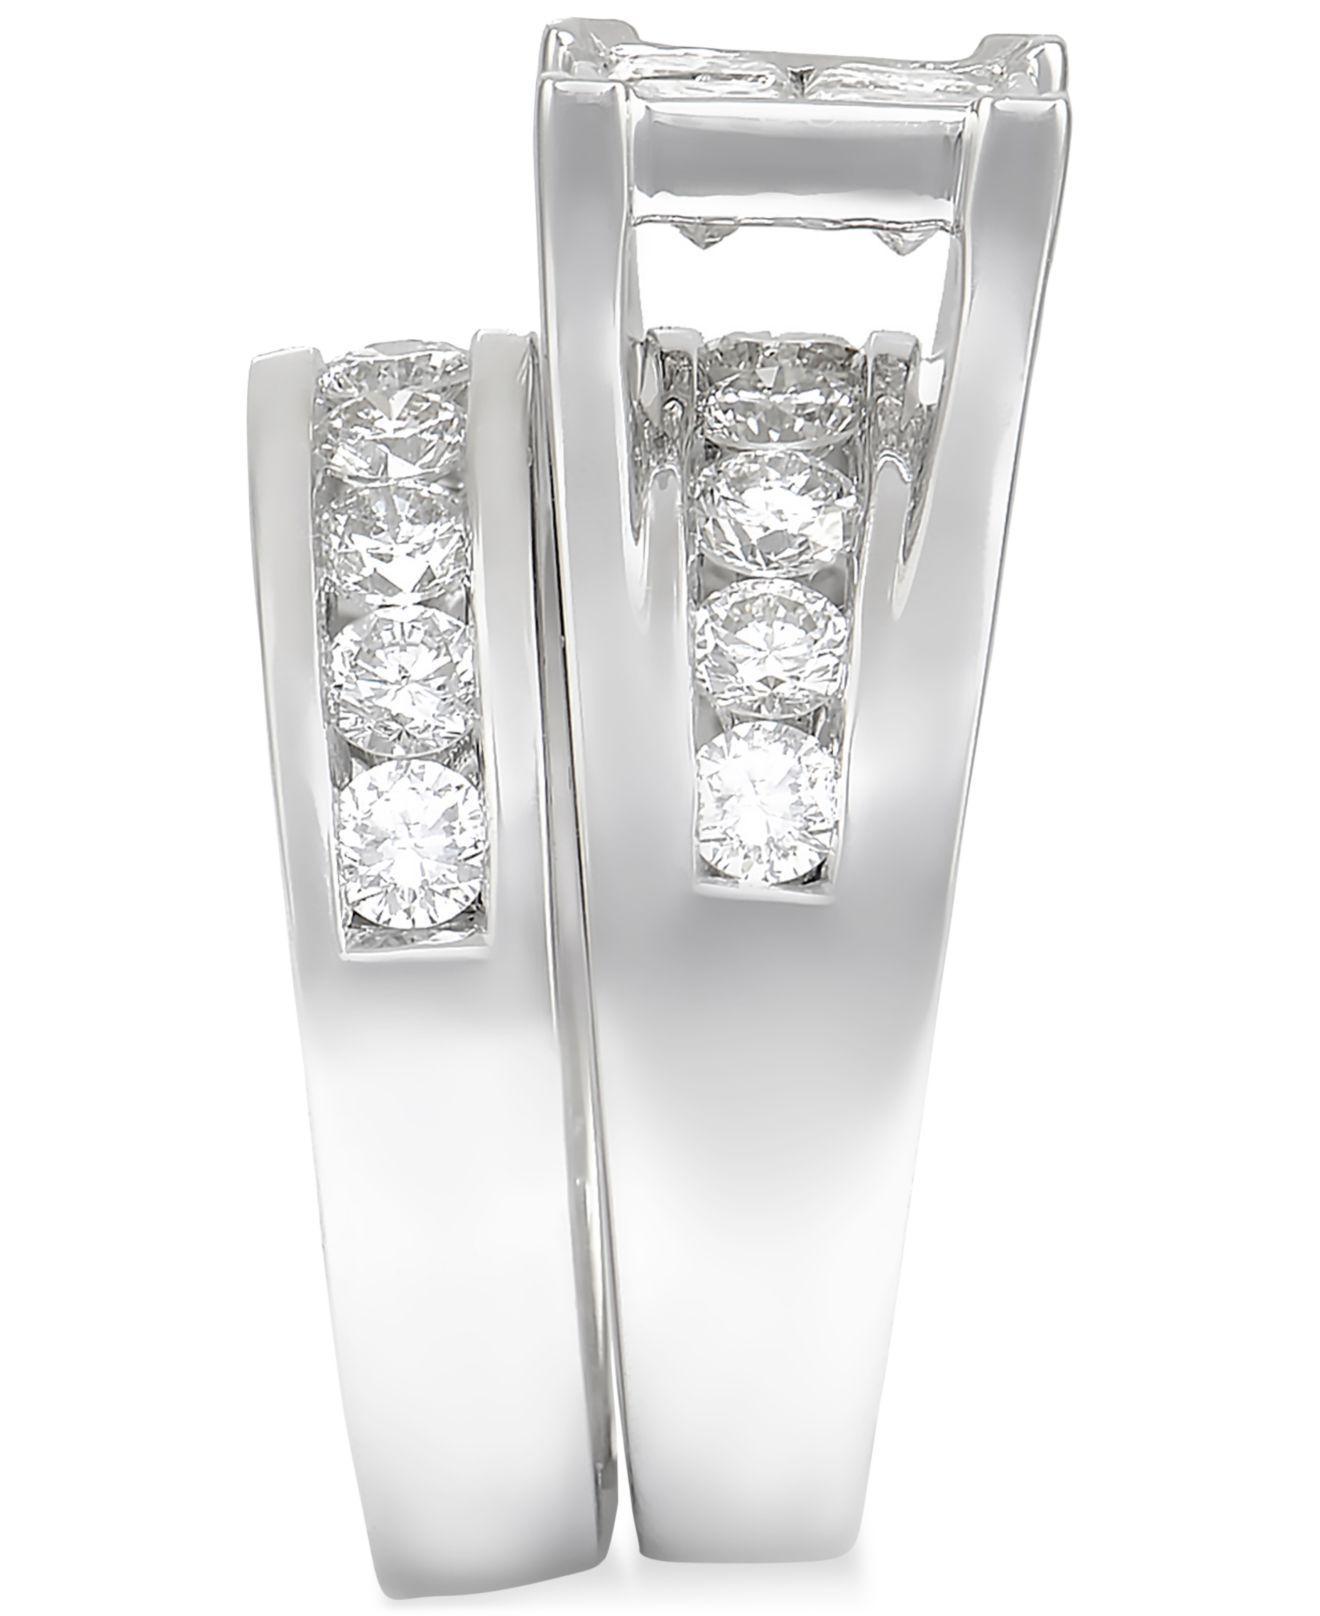 Macy s Diamond Channel set Bridal Set 3 Ct T w In 14k White